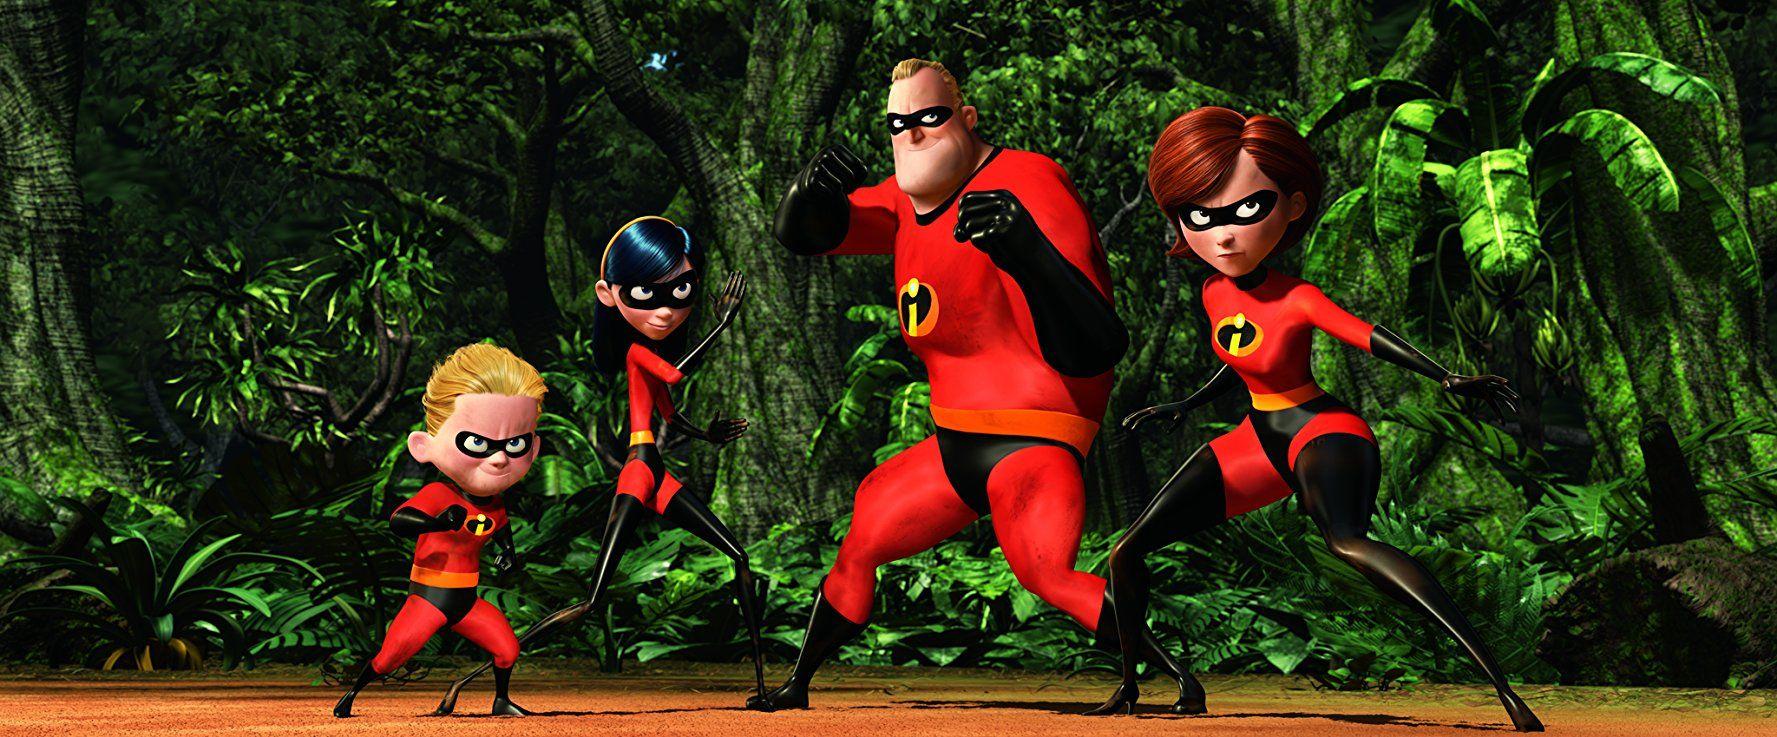 18 The Incredibles - Walt Disney Company